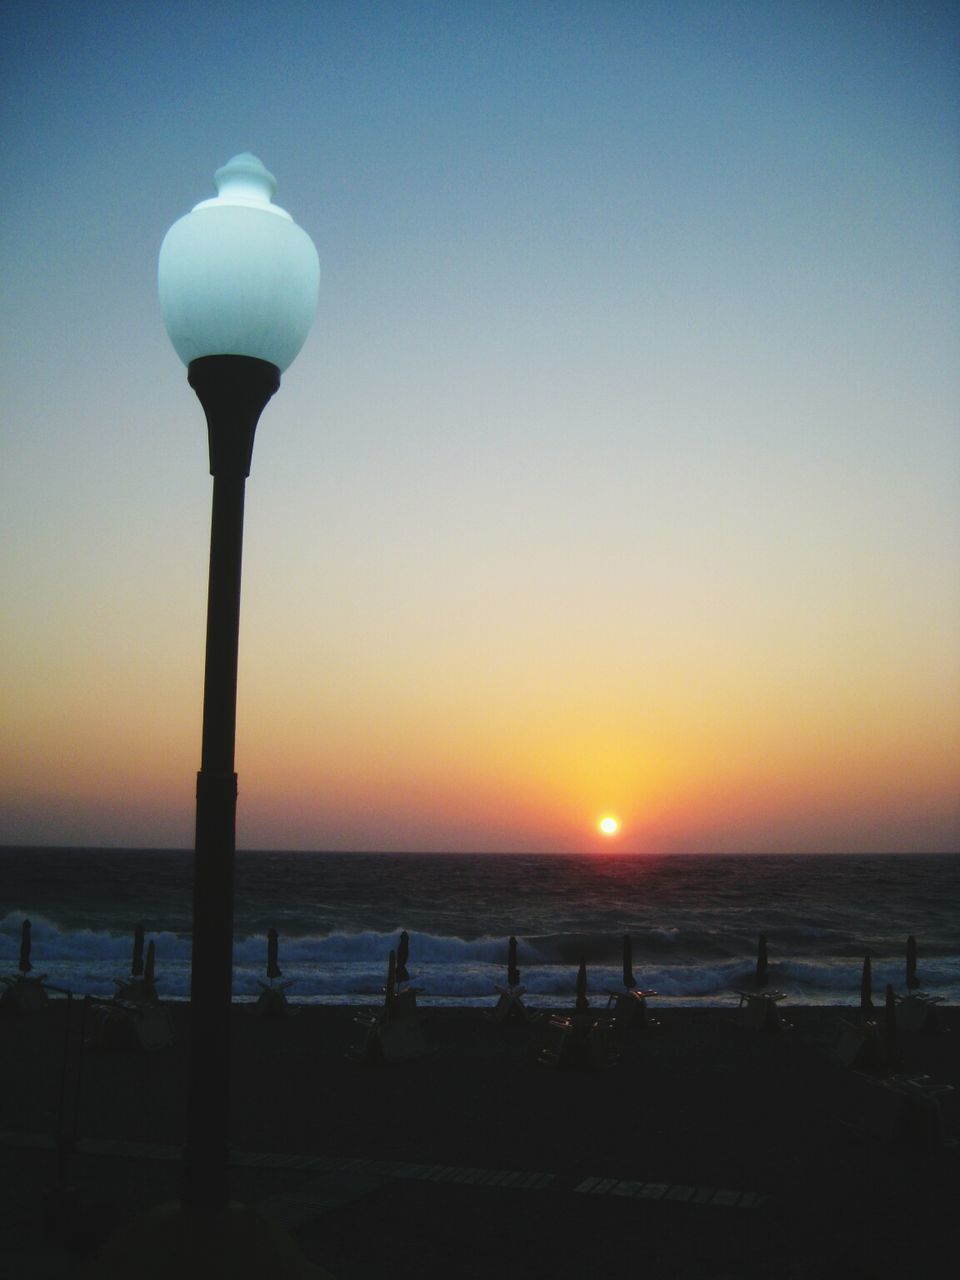 sunset, sea, beach, sun, lighting equipment, silhouette, nature, scenics, outdoors, beauty in nature, water, no people, horizon over water, tranquility, sky, illuminated